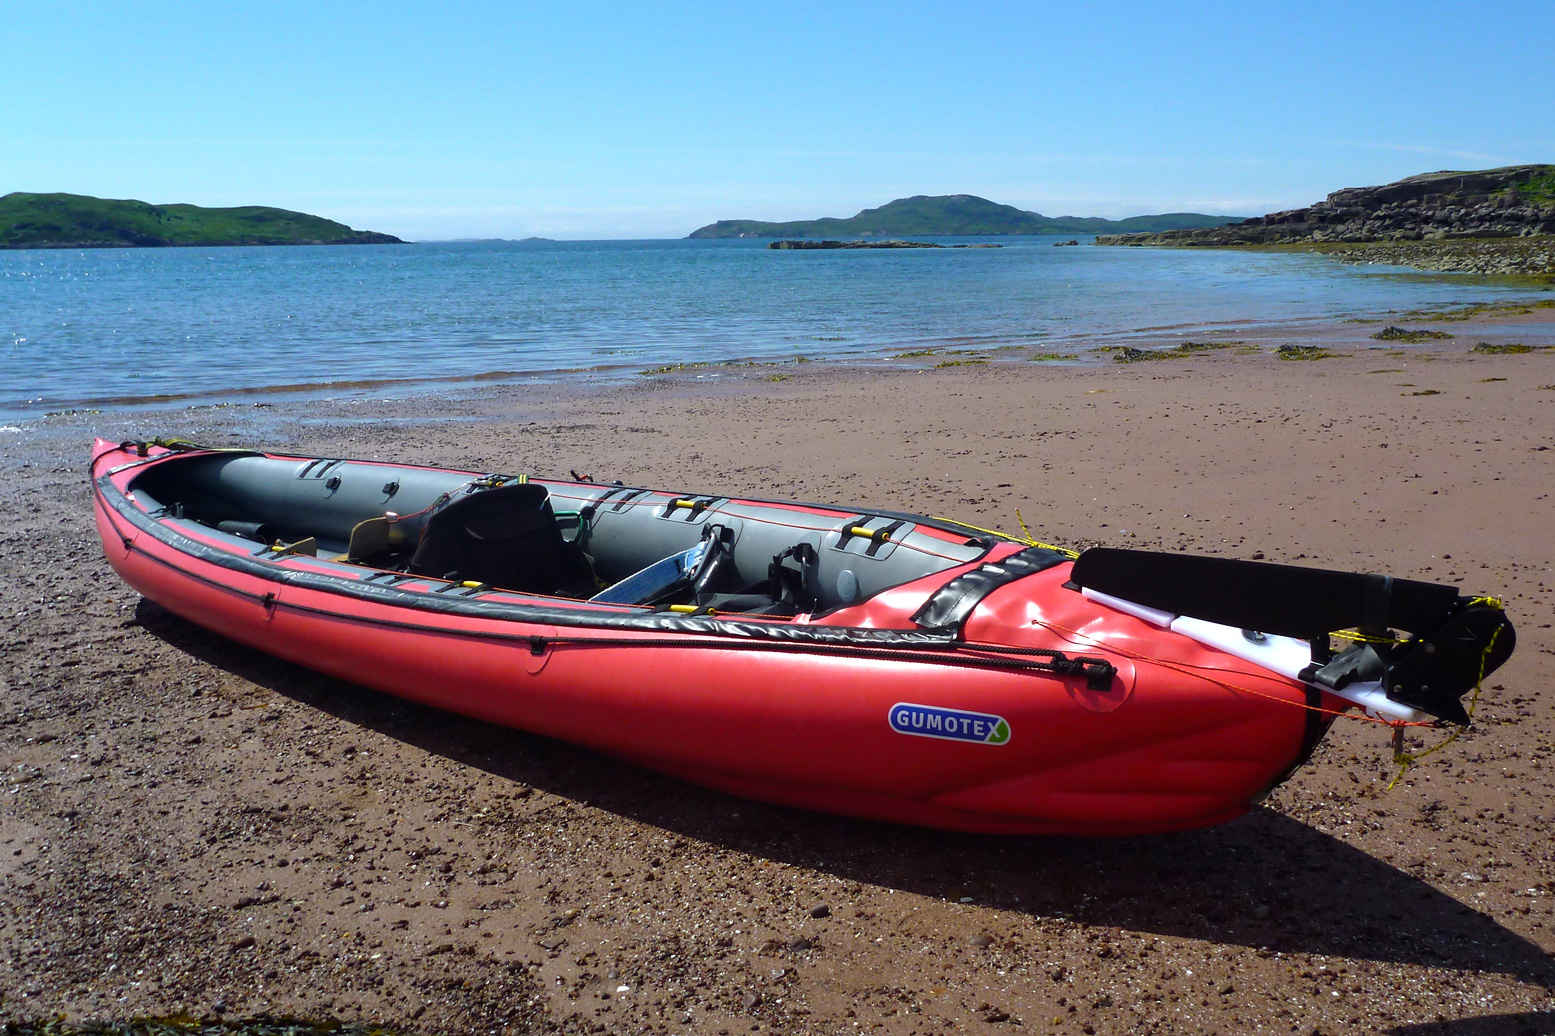 Seawave Rudder MkII tested | Inflatable Kayaks & Packrafts